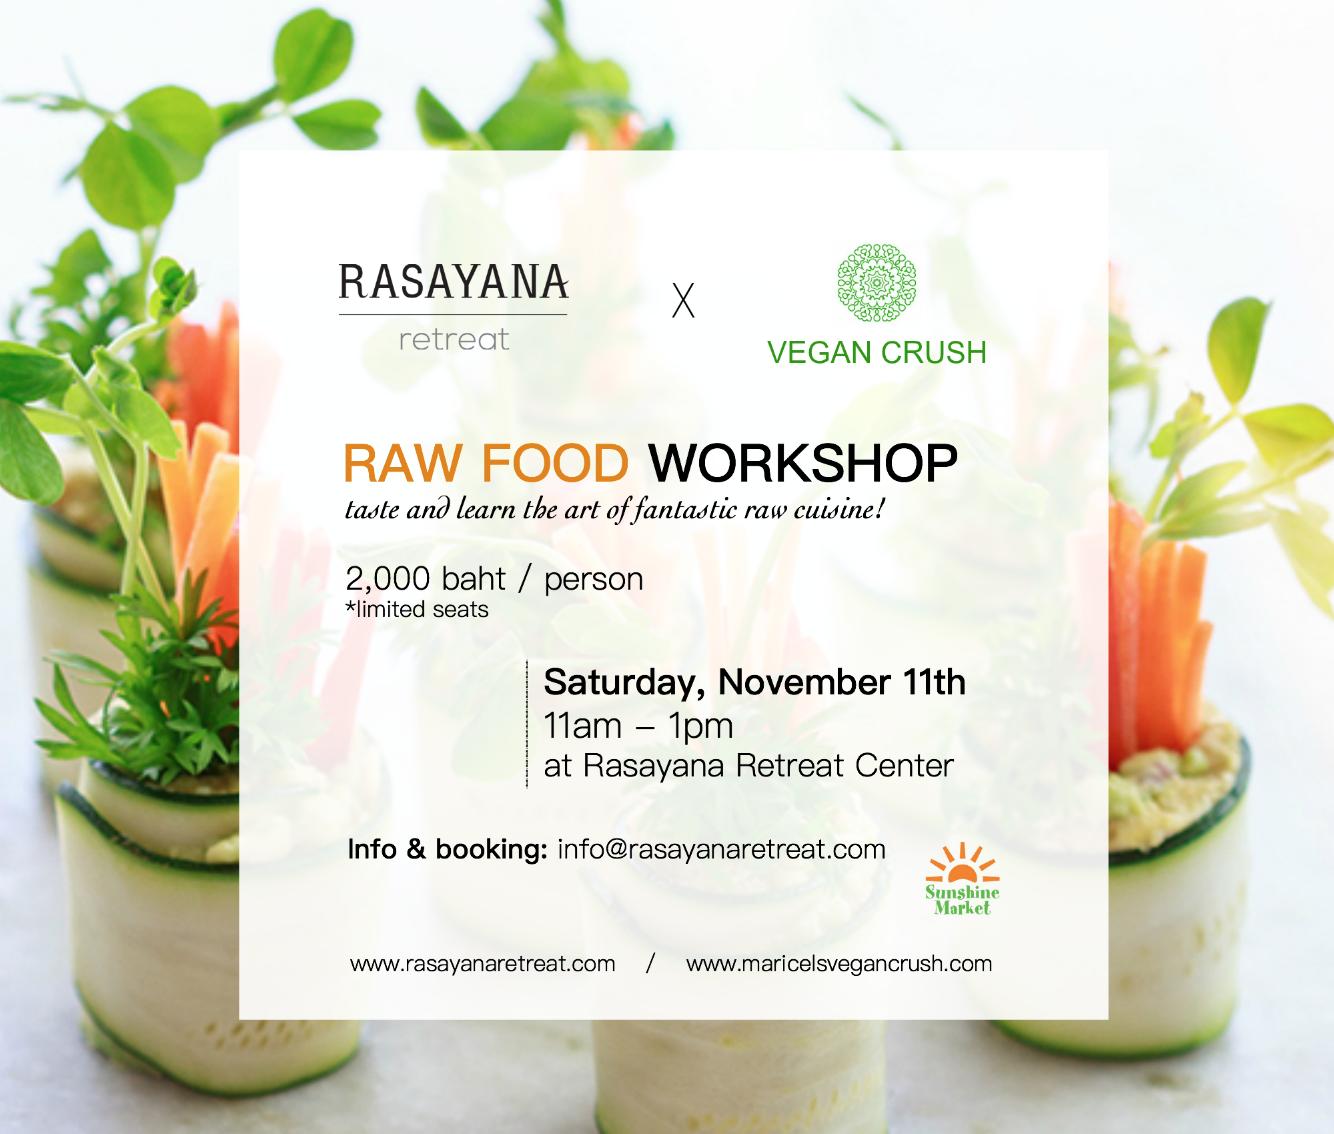 Food Workshop, Vegan, Vegetarian